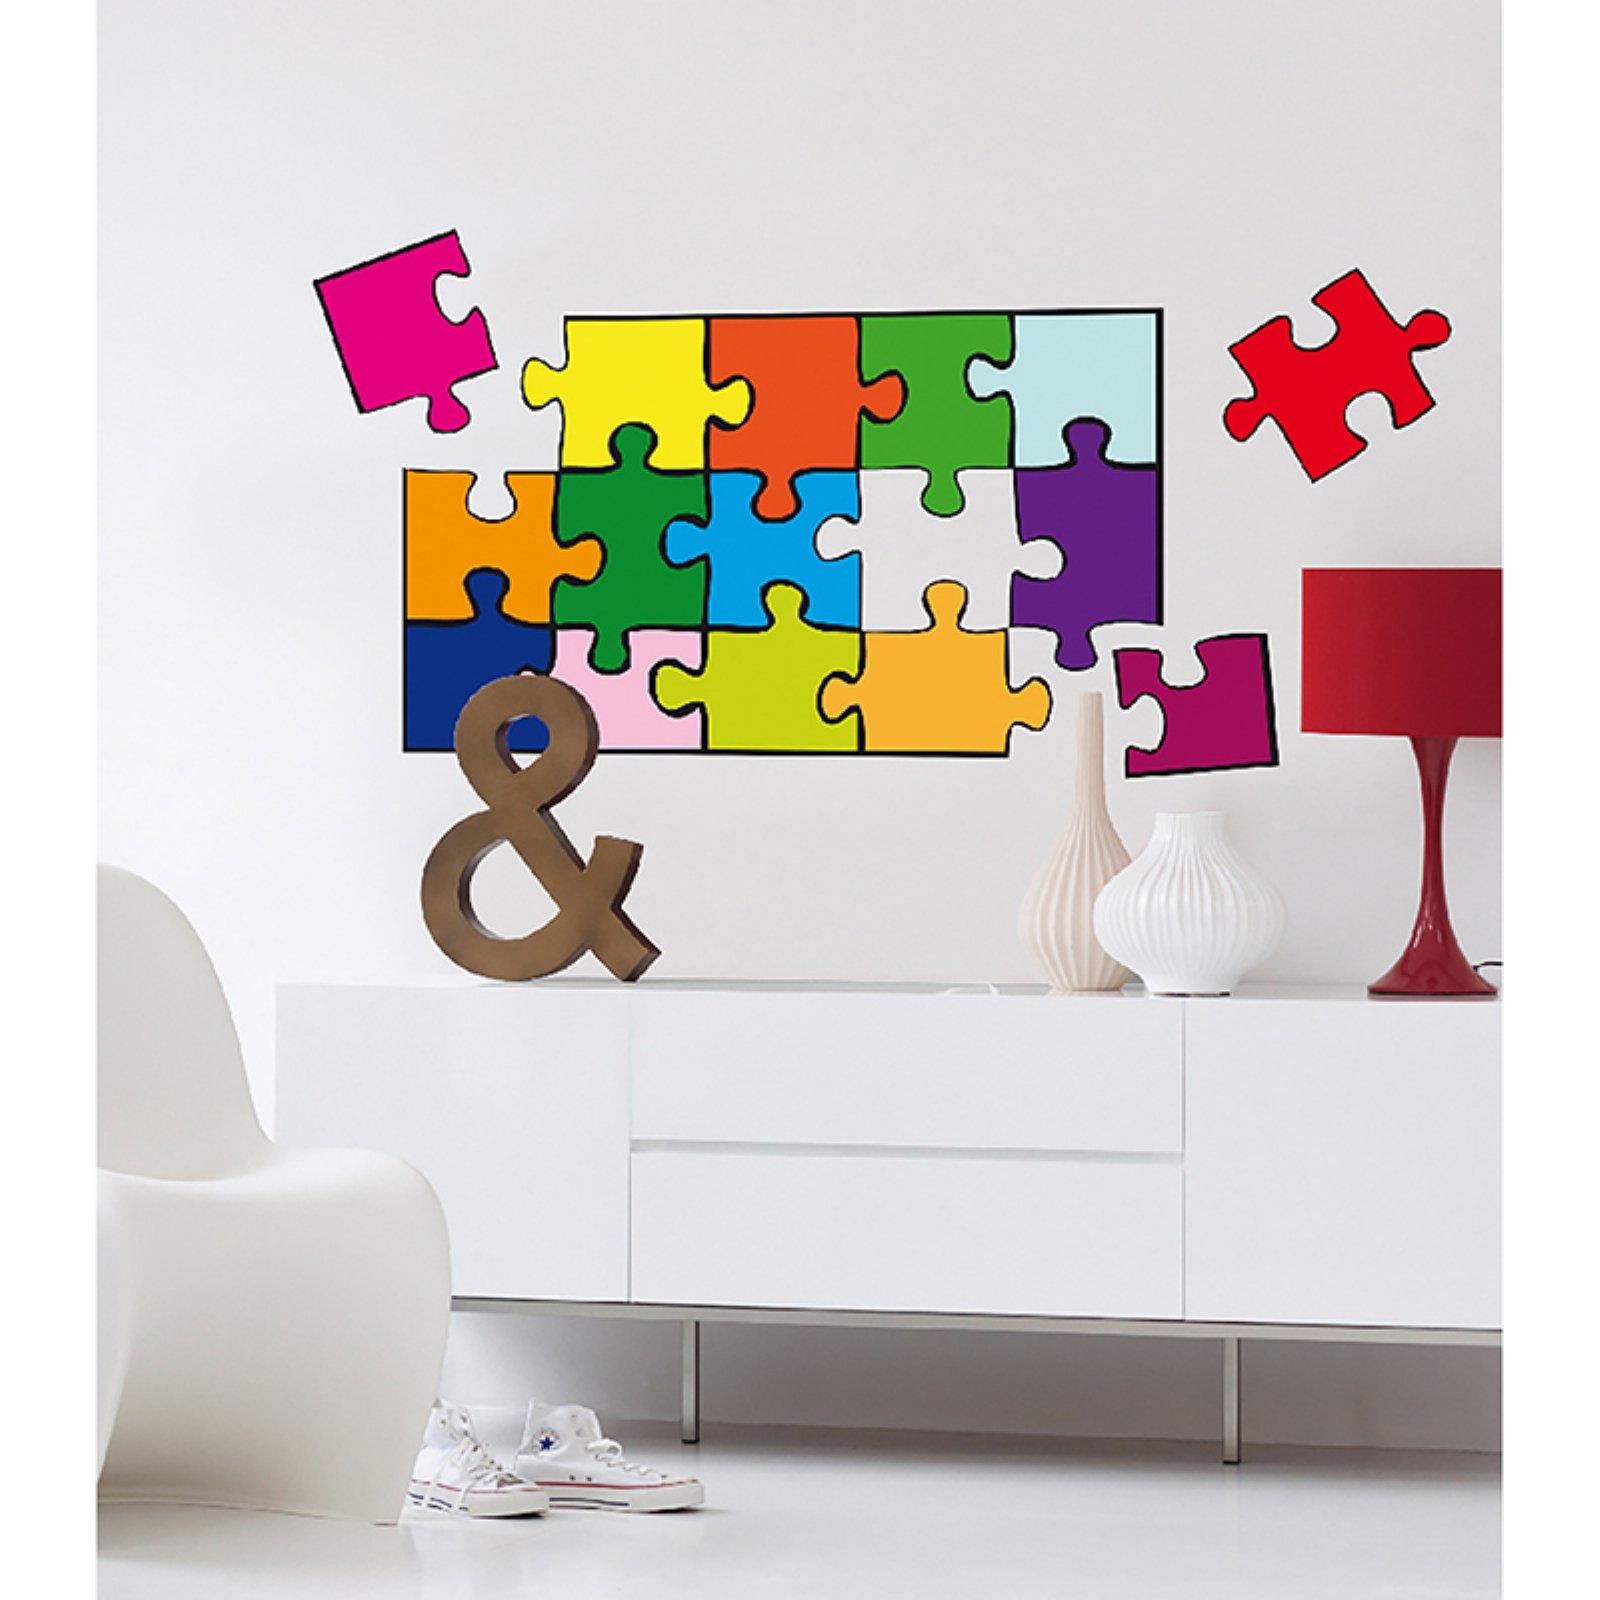 ideal d cor puzzle wall decals. Black Bedroom Furniture Sets. Home Design Ideas